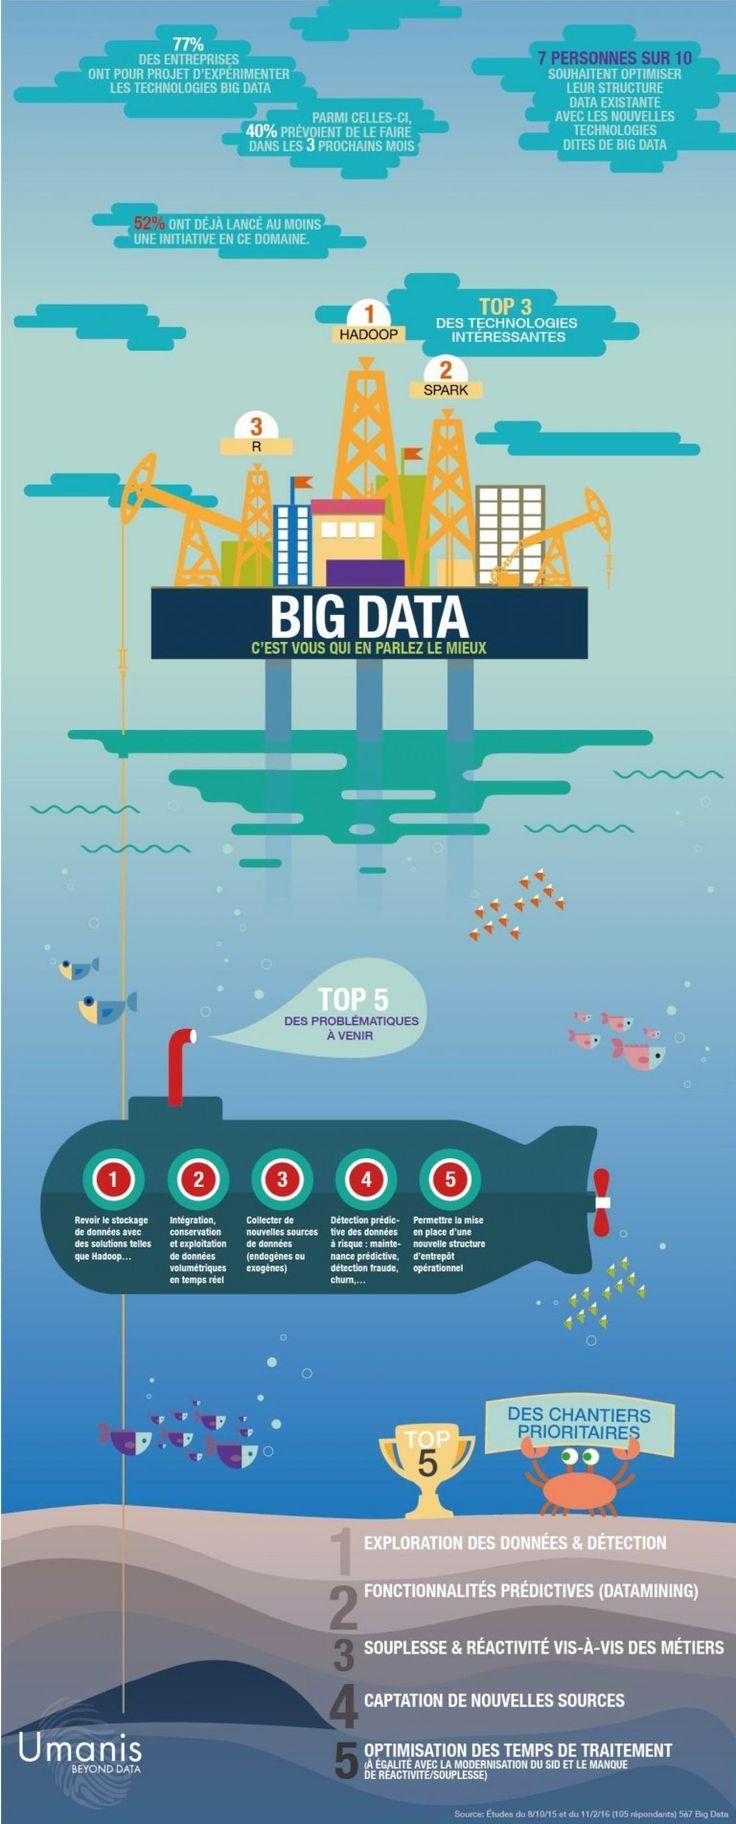 big-data-umanis-france